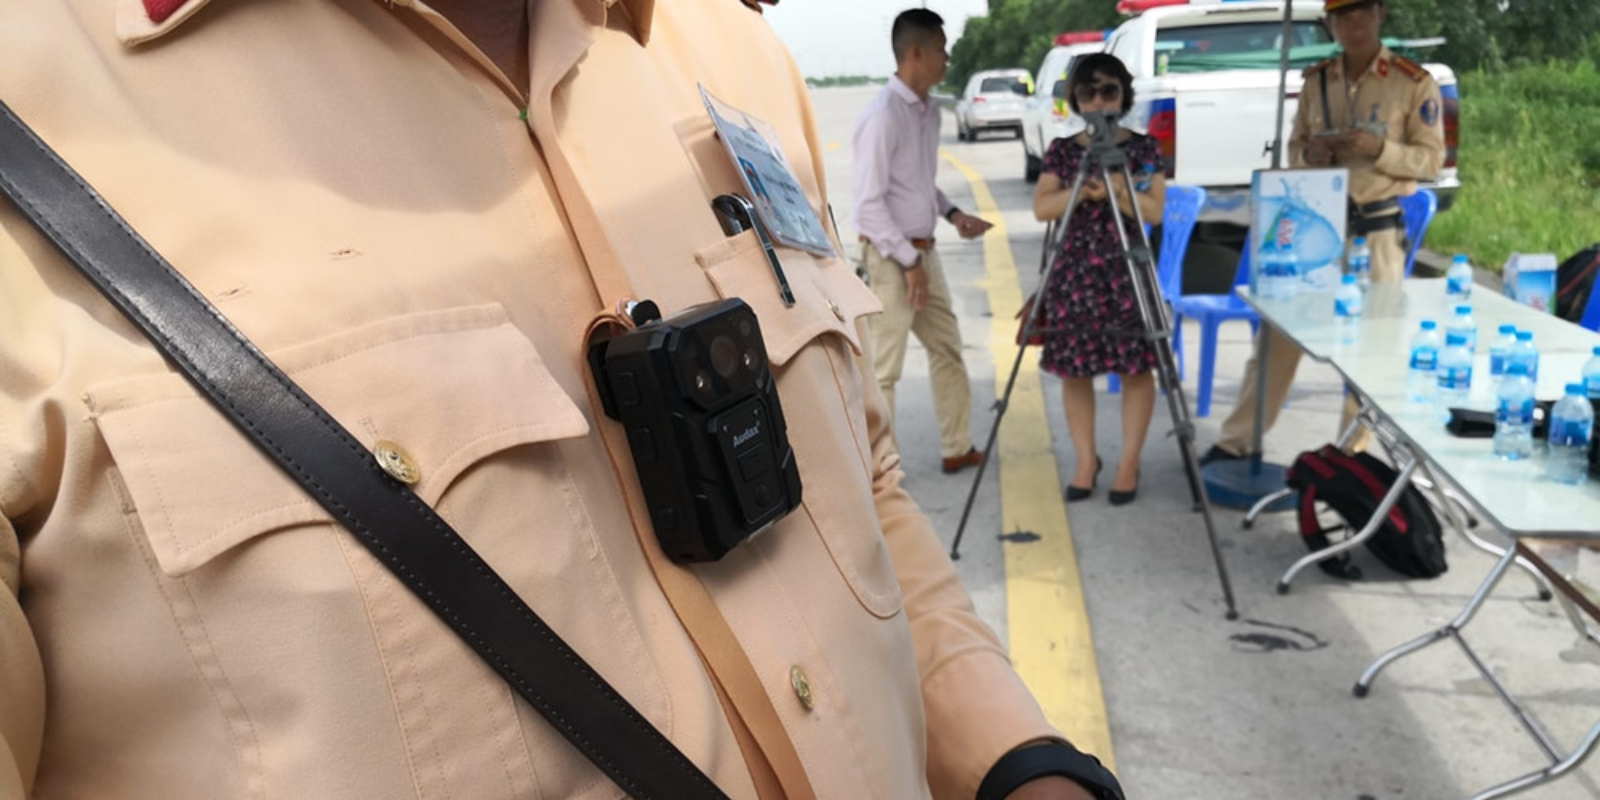 Dan phuot cung them khat so huu camera gan nguc cua CSGT Viet Nam-Hinh-2